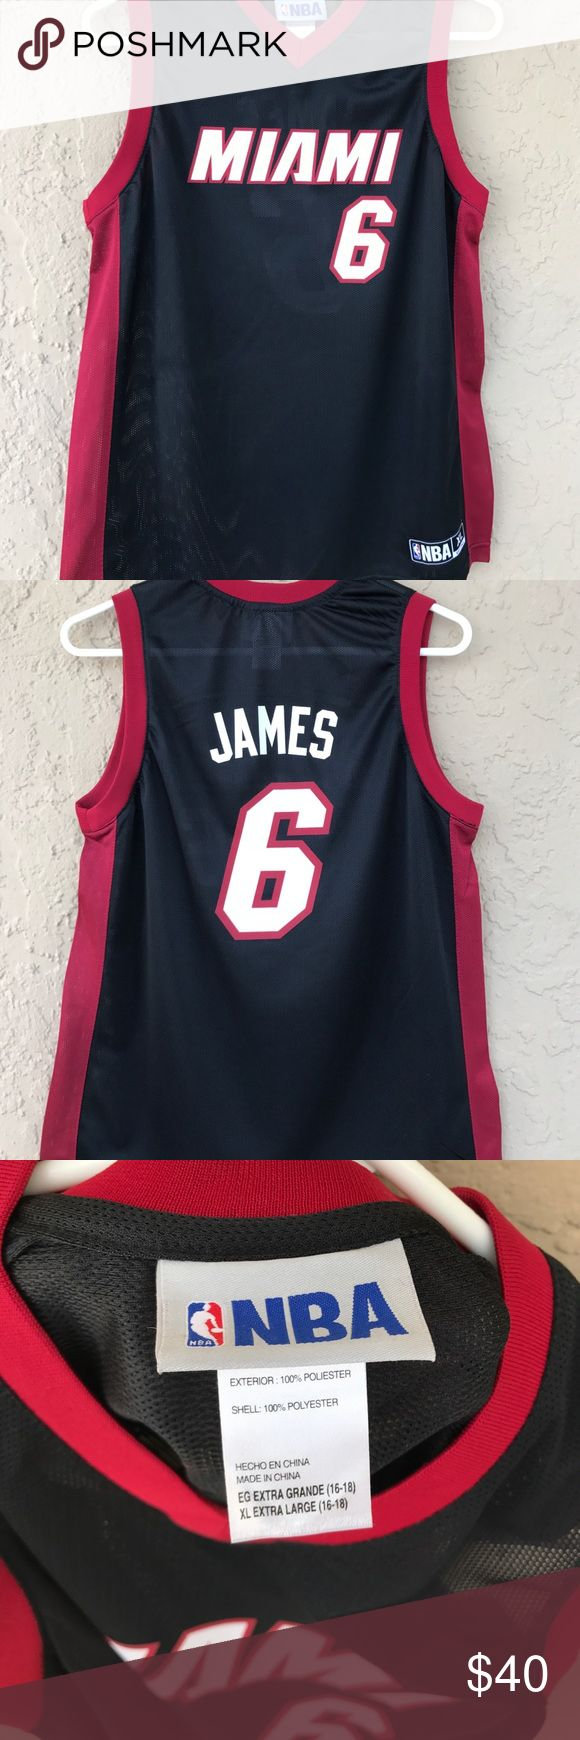 EUC! LeBron James #6 NBA Jersey EUC!! #6 James Jersey... Like New!!! opt Shirts & Tops Tees - Short Sleeve